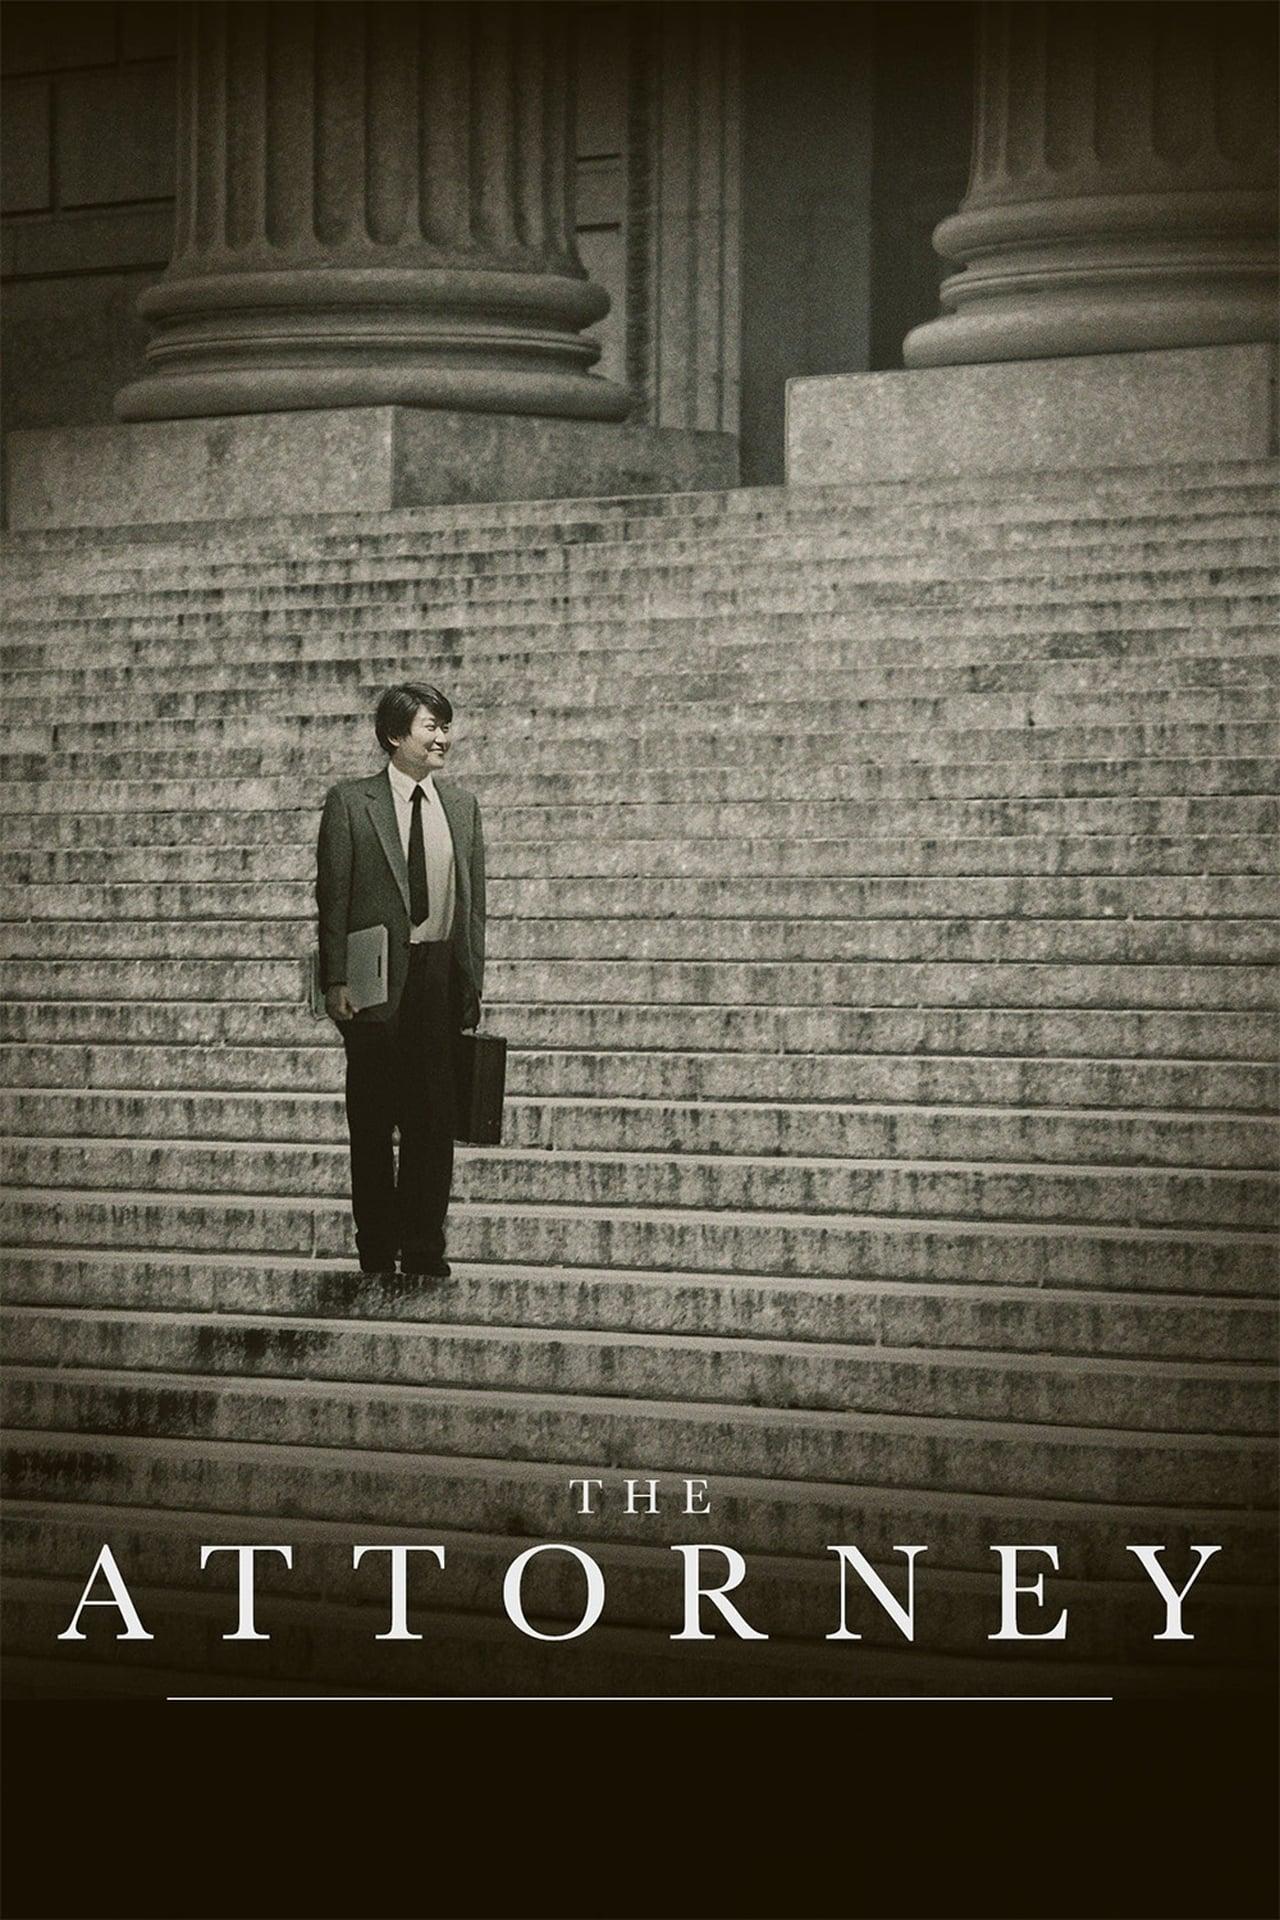 The Attorney